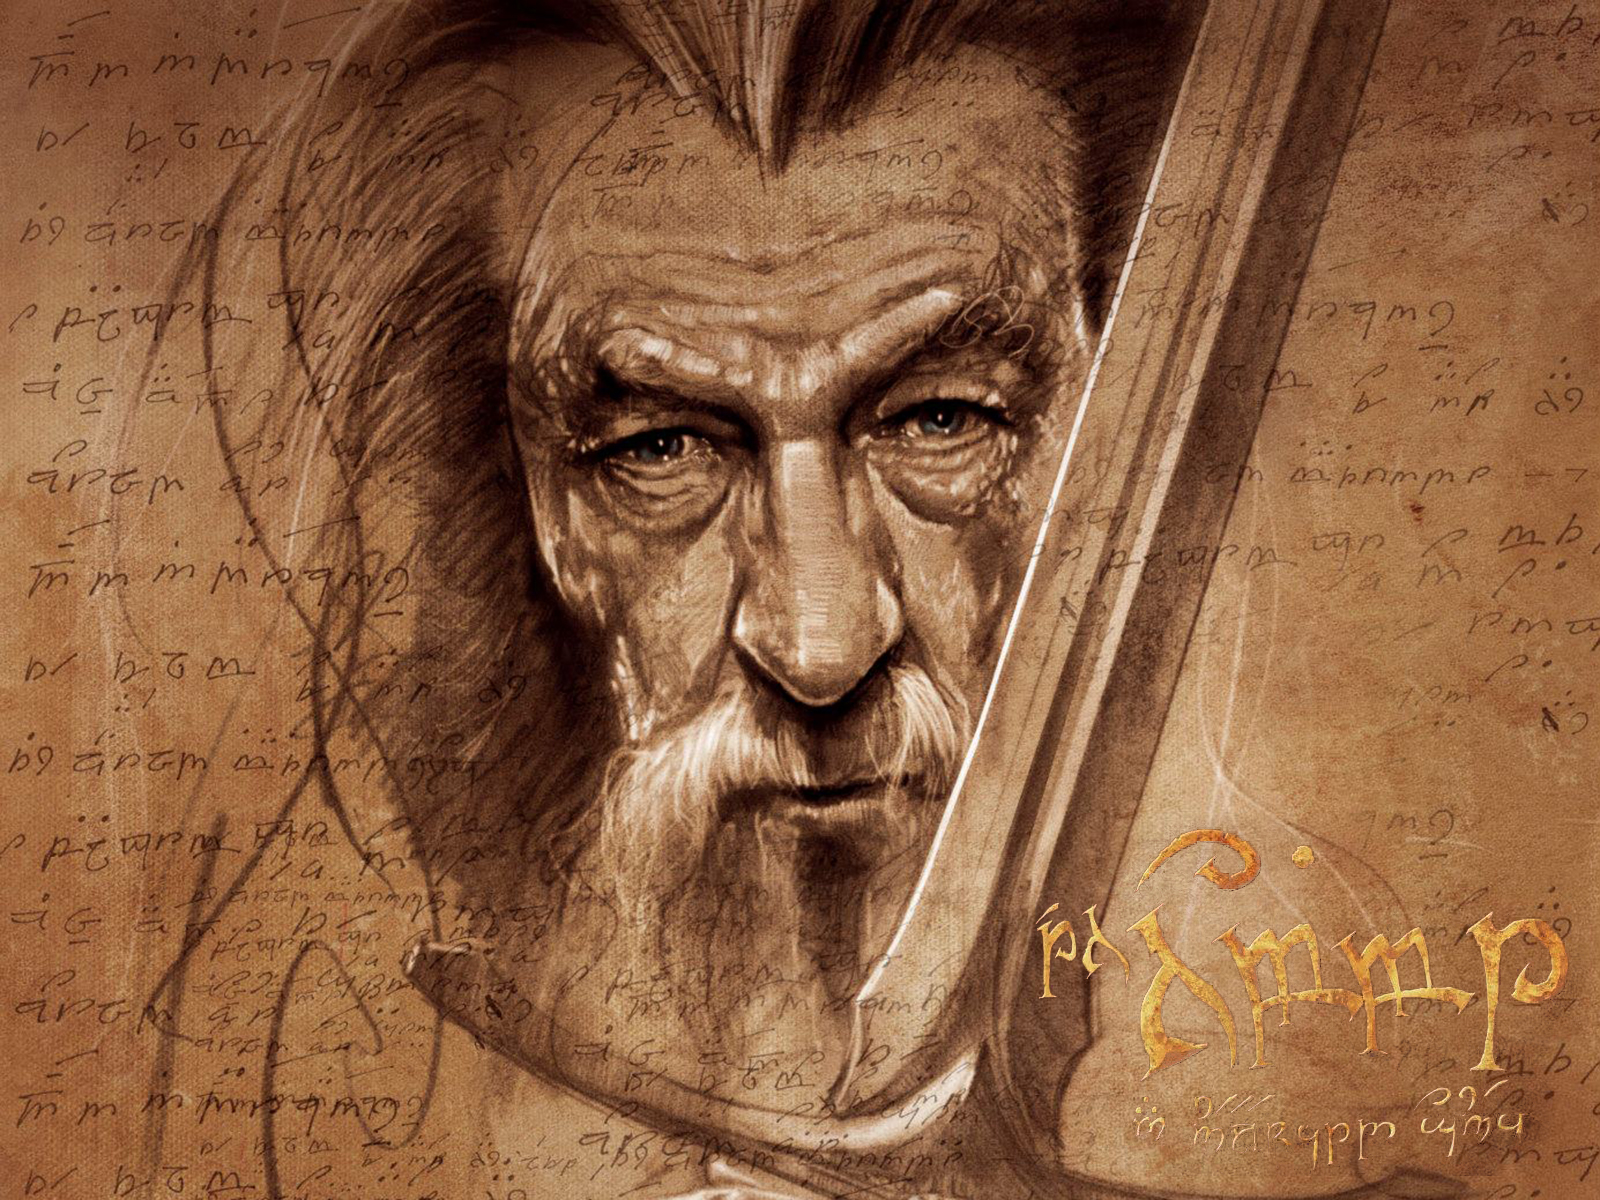 gandalf the hobbit Jan 01 2013 071354 Picture Gallery 1600x1200